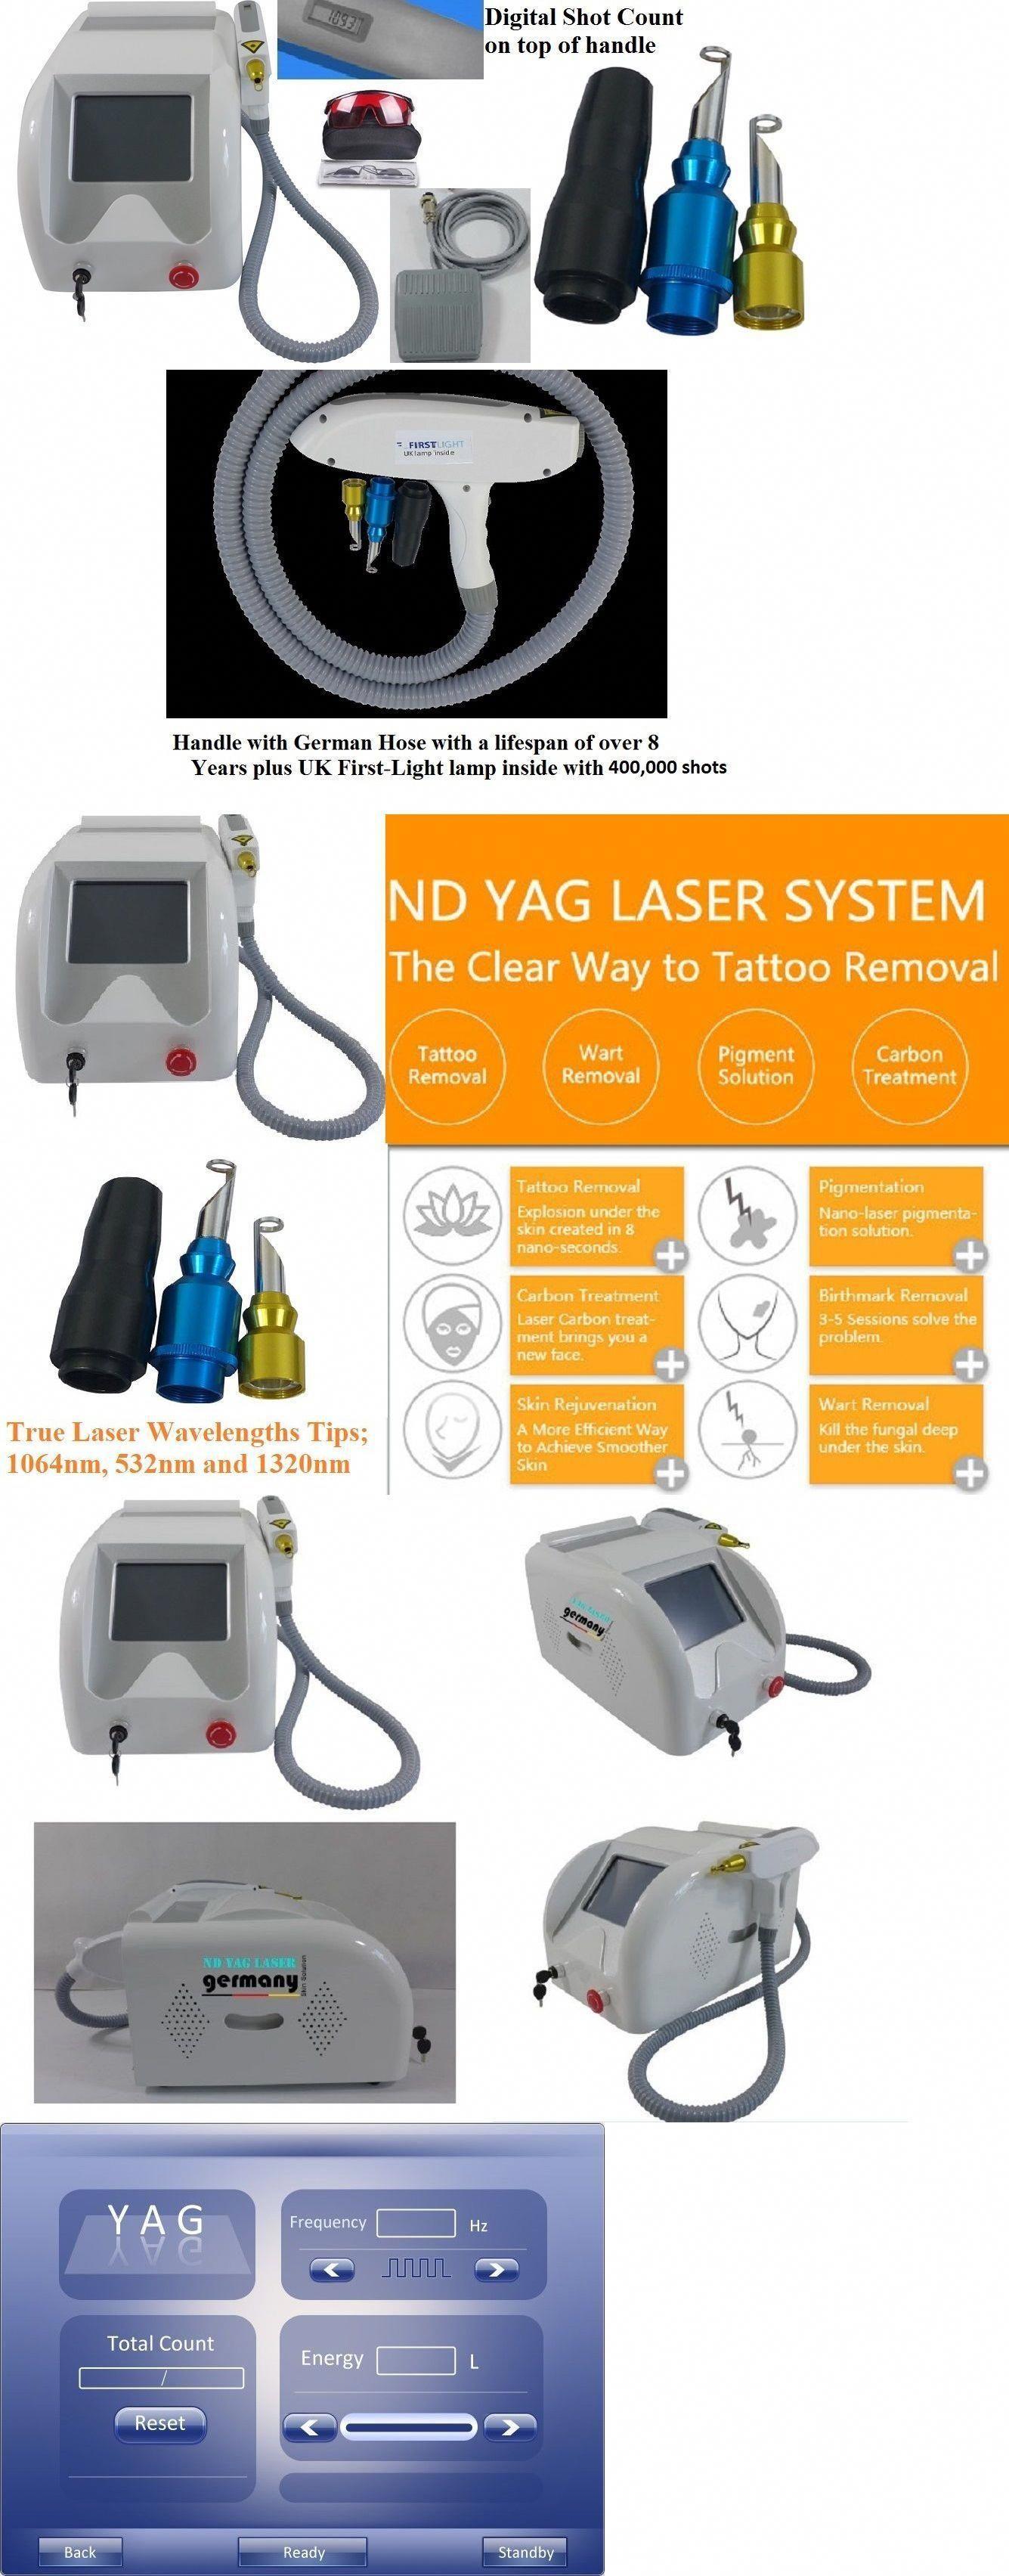 Tattoo Removal Tattoo Removal Machines German Laser